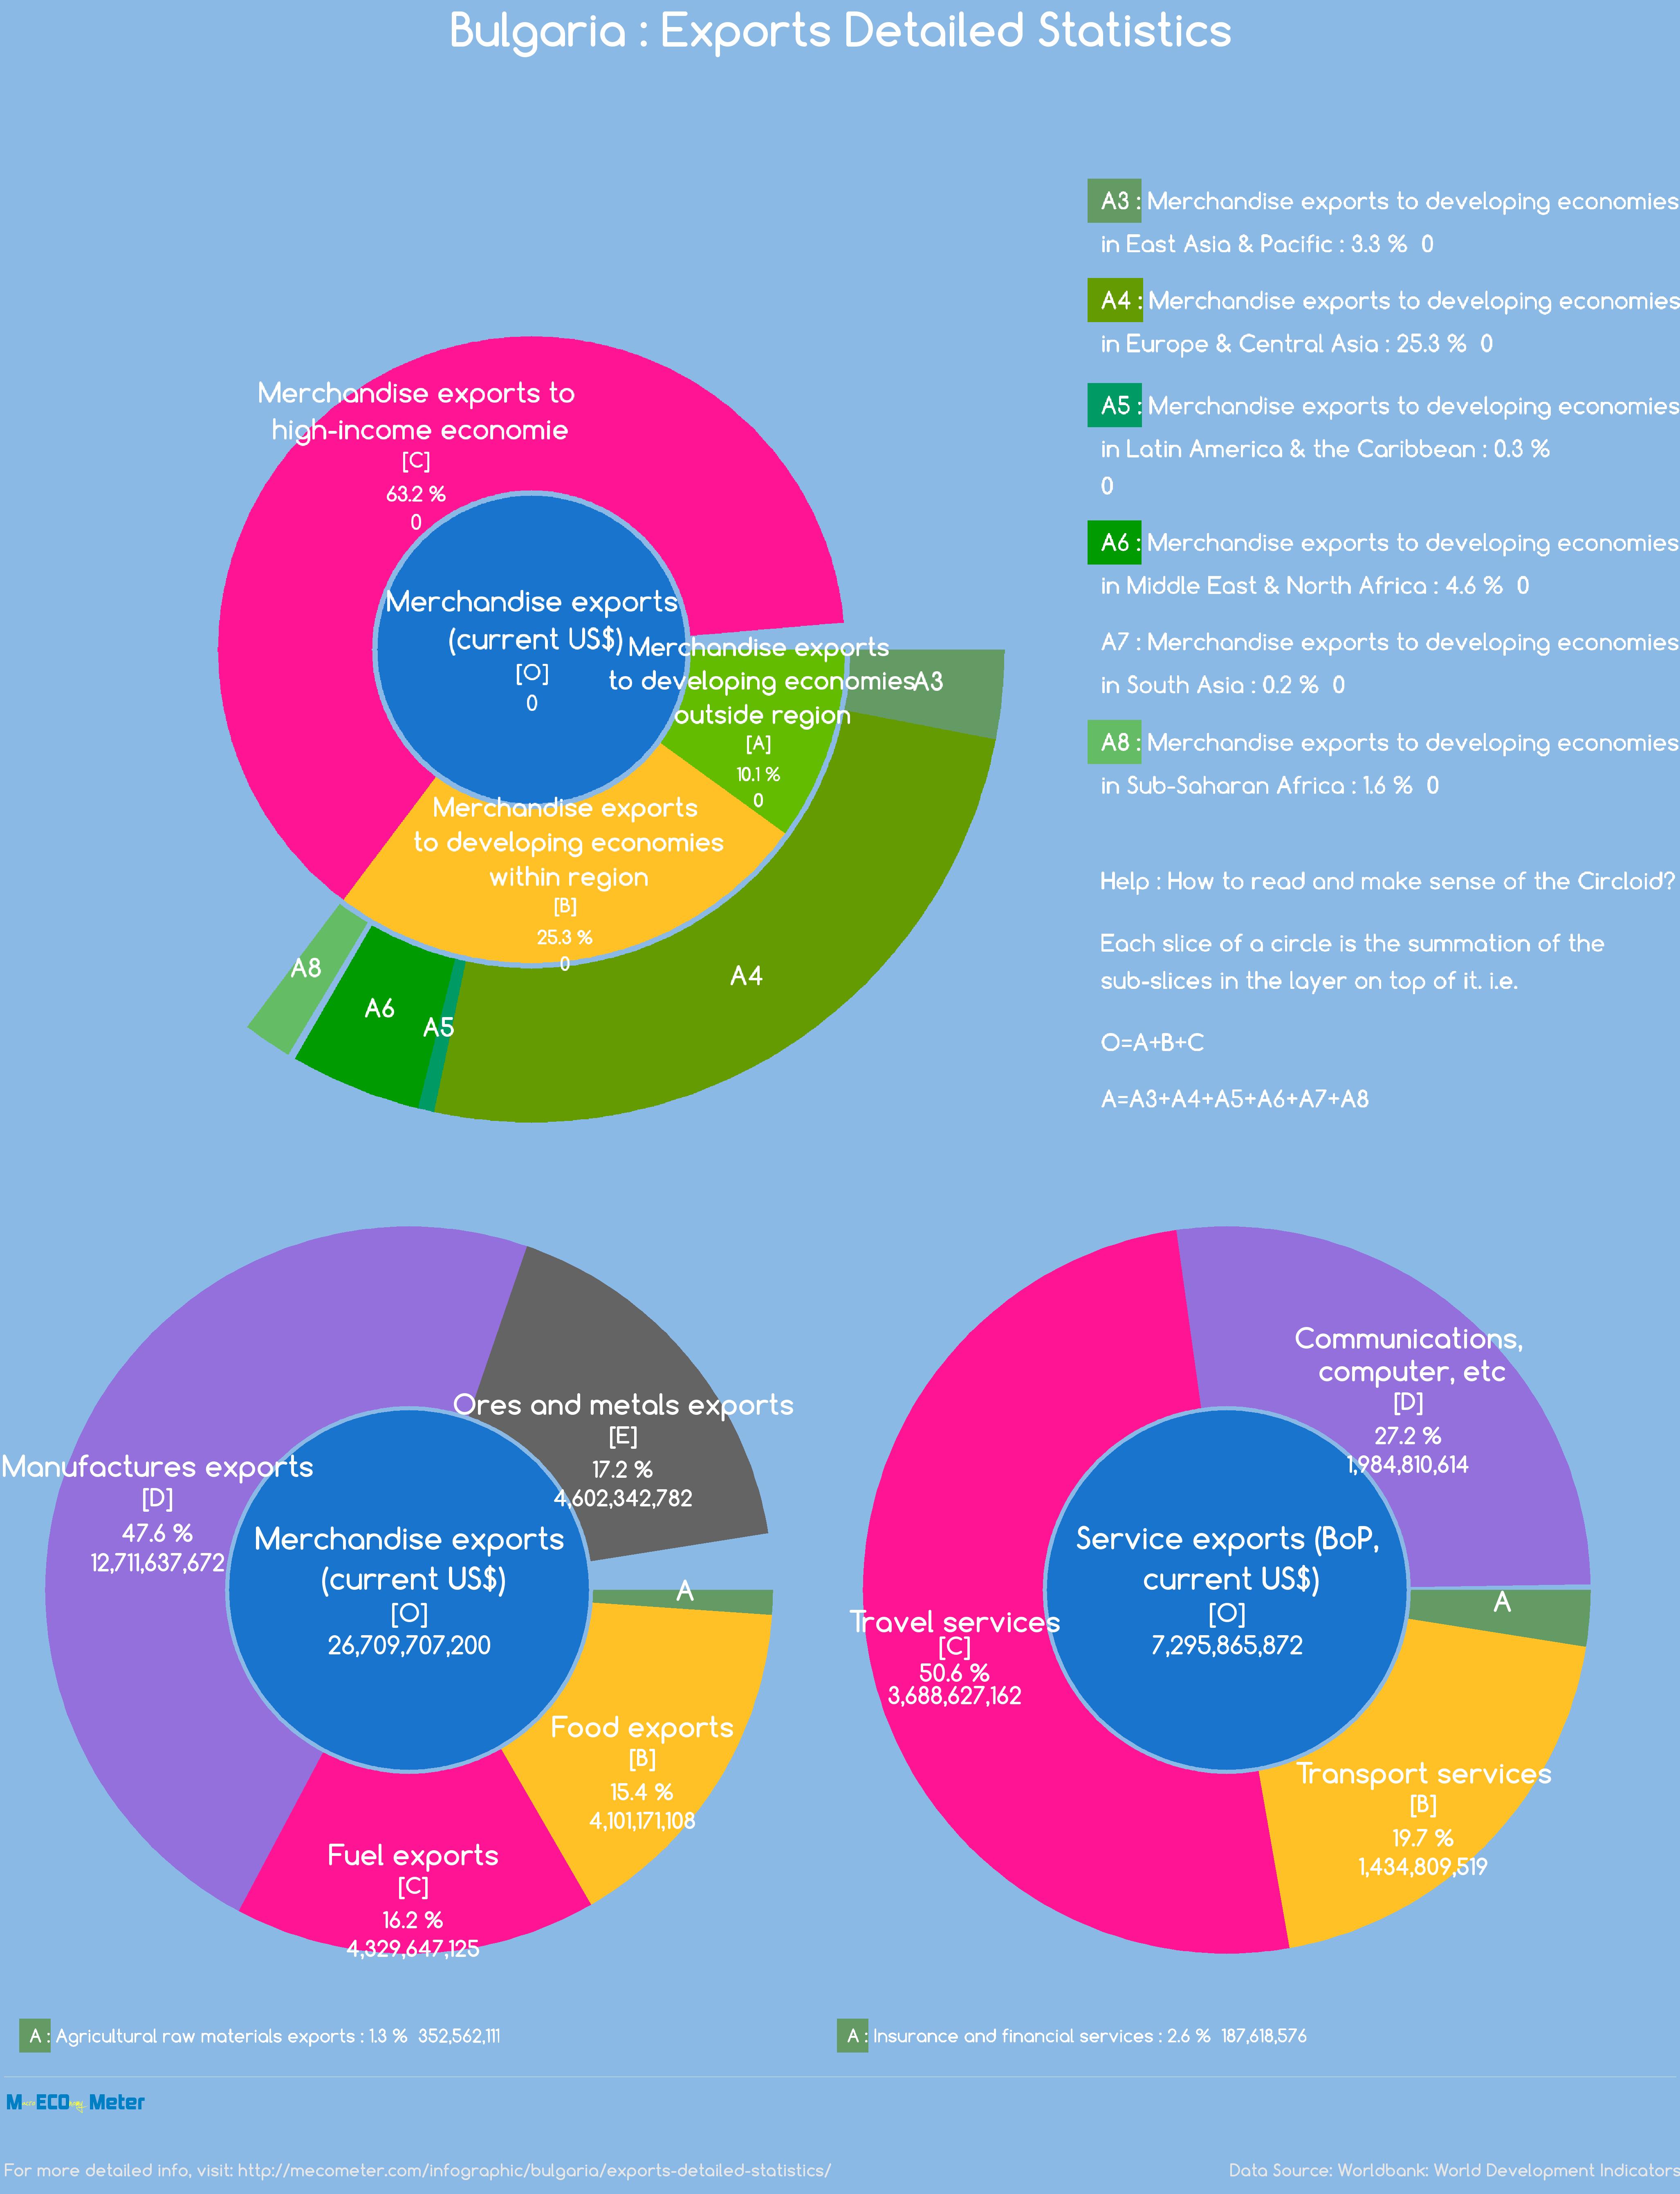 Bulgaria : Exports Detailed Statistics